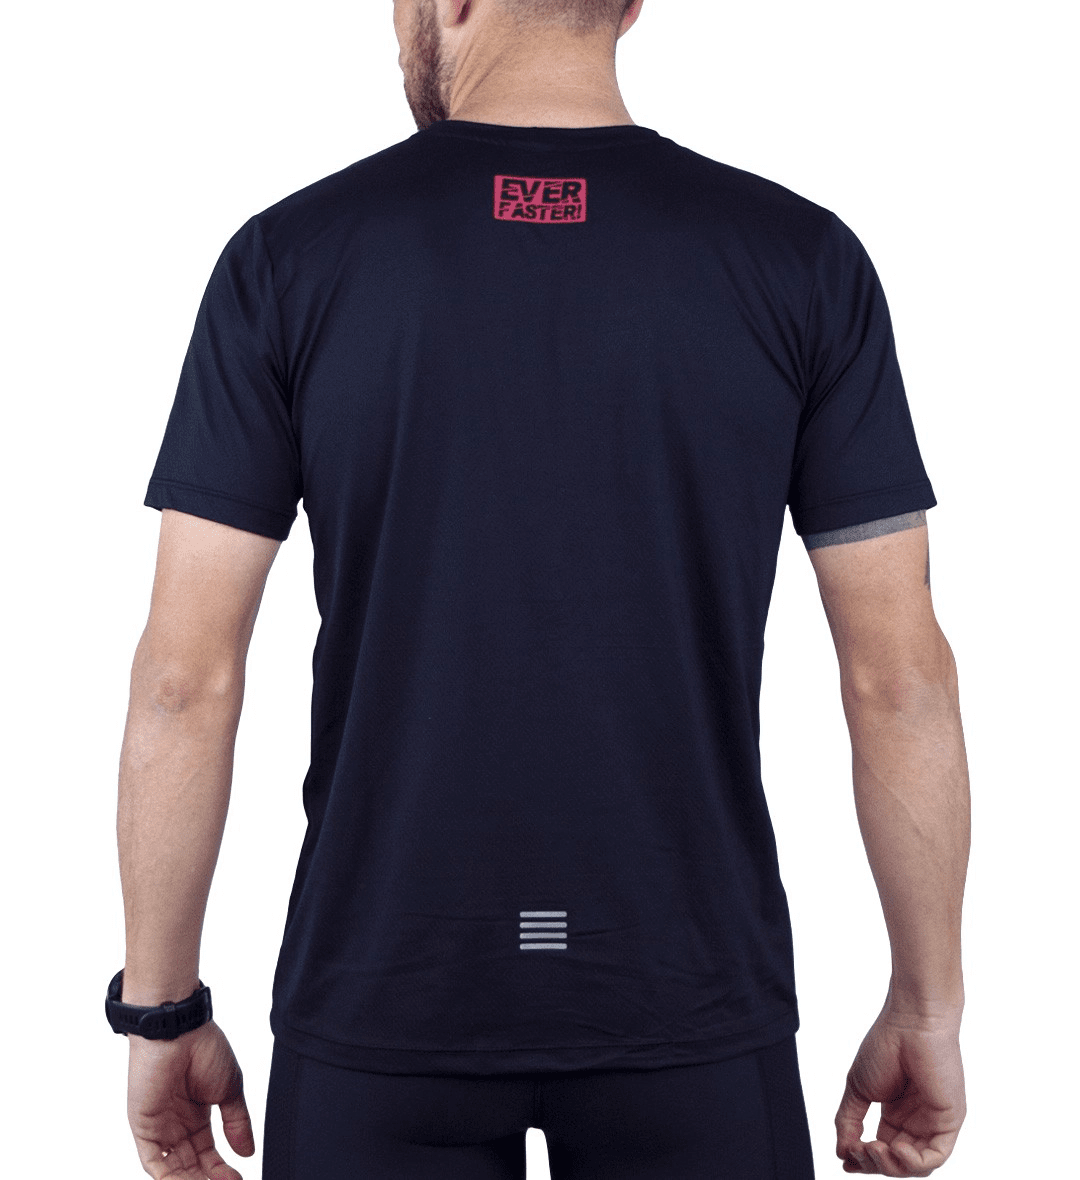 Camiseta Running Ever Faster Eros Masc 2021